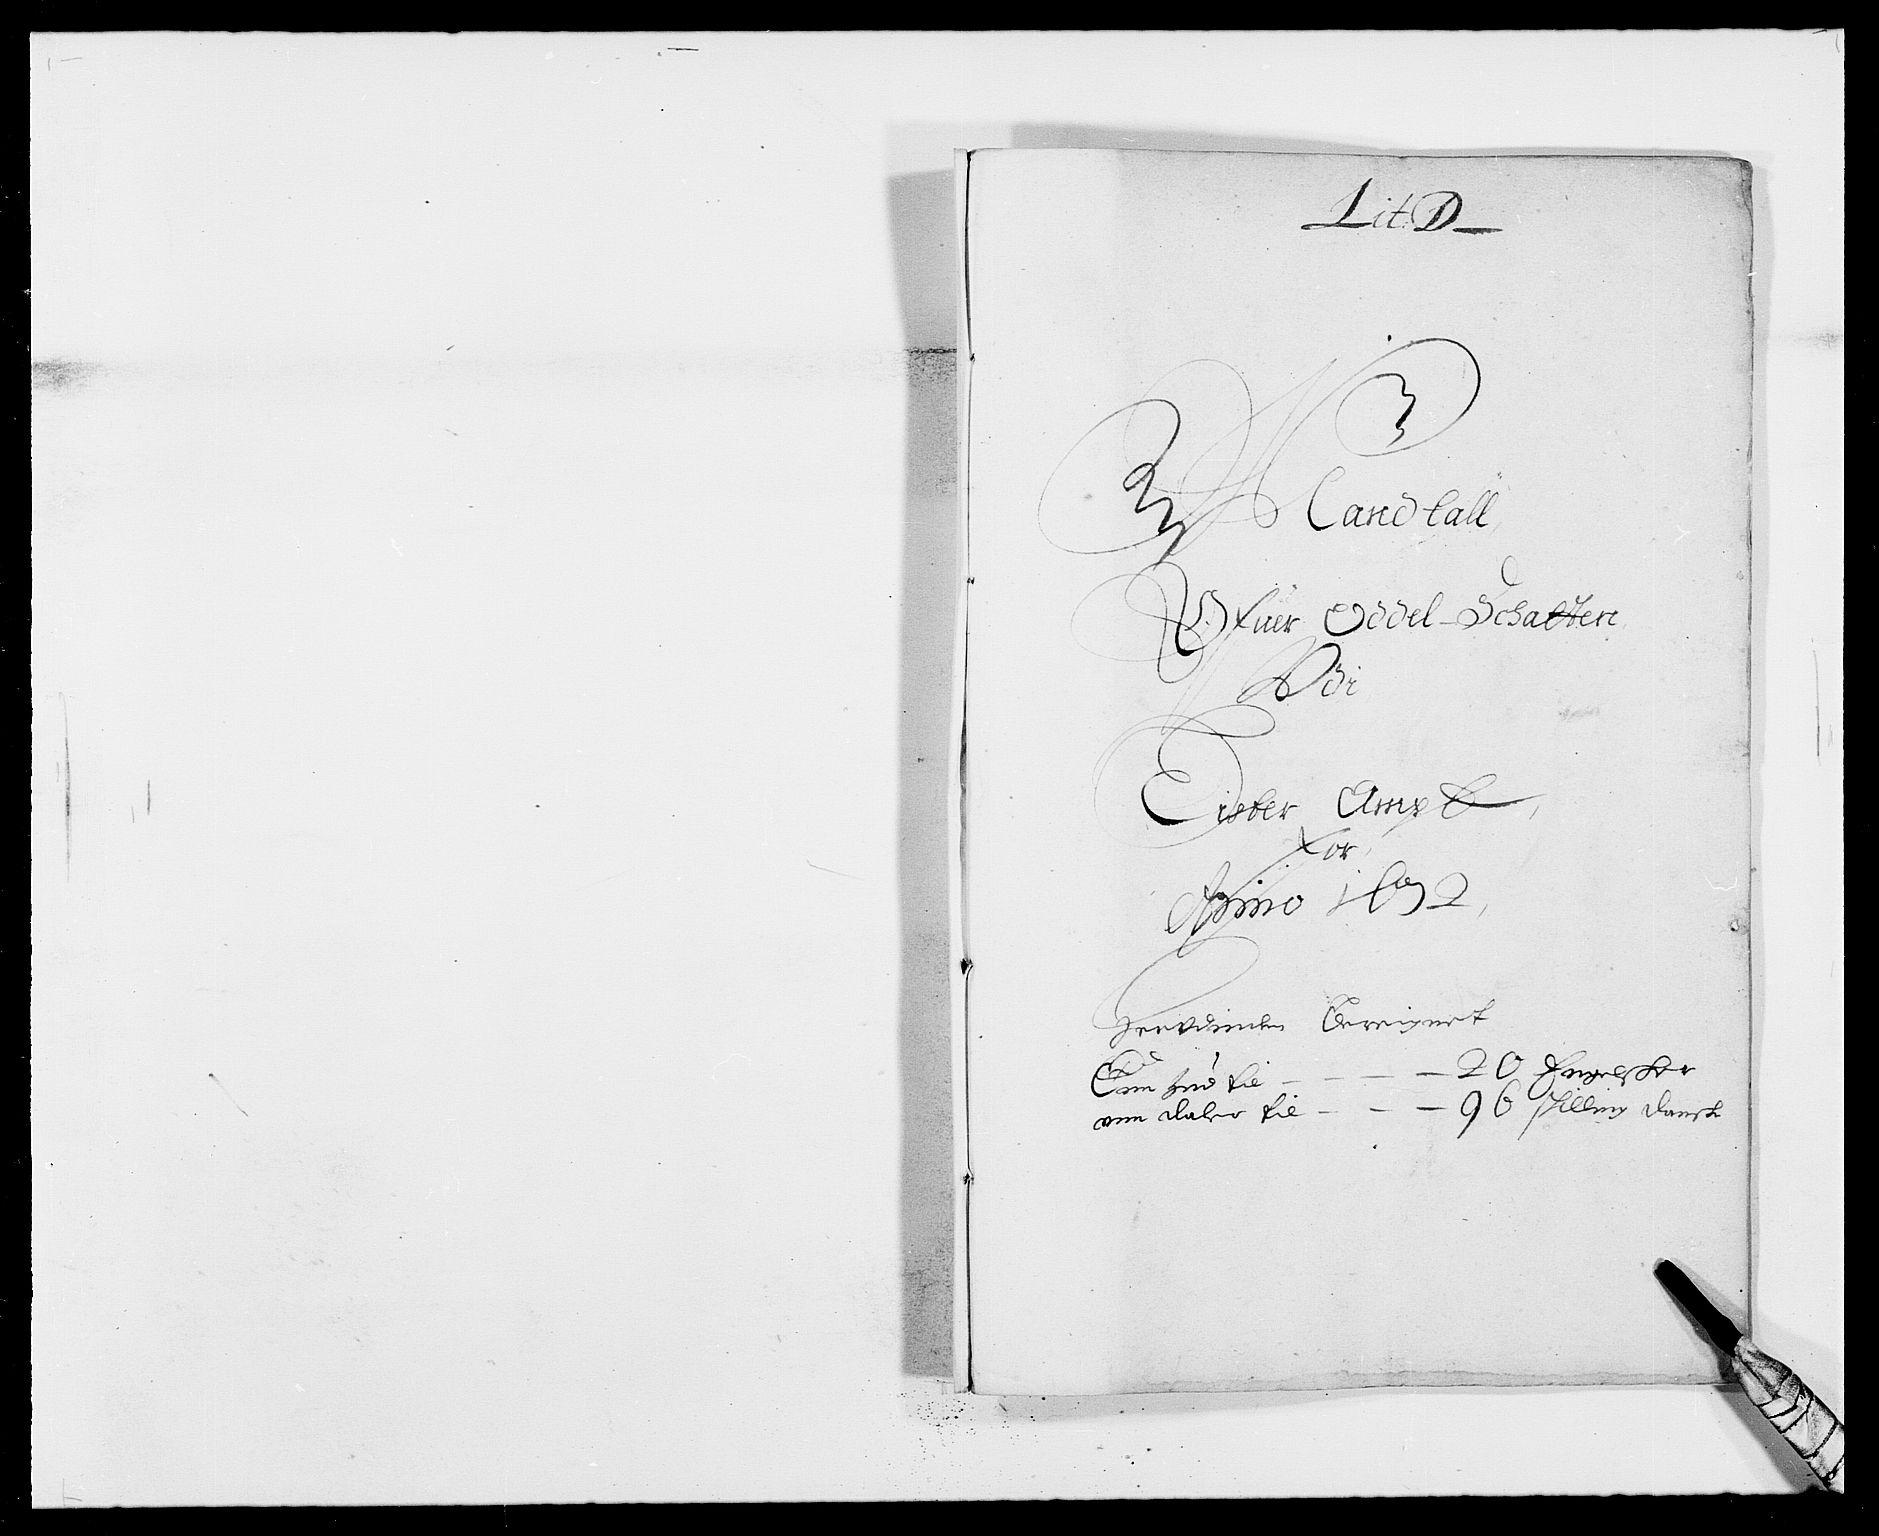 RA, Rentekammeret inntil 1814, Reviderte regnskaper, Fogderegnskap, R41/L2526: Fogderegnskap Lista, 1672, s. 128